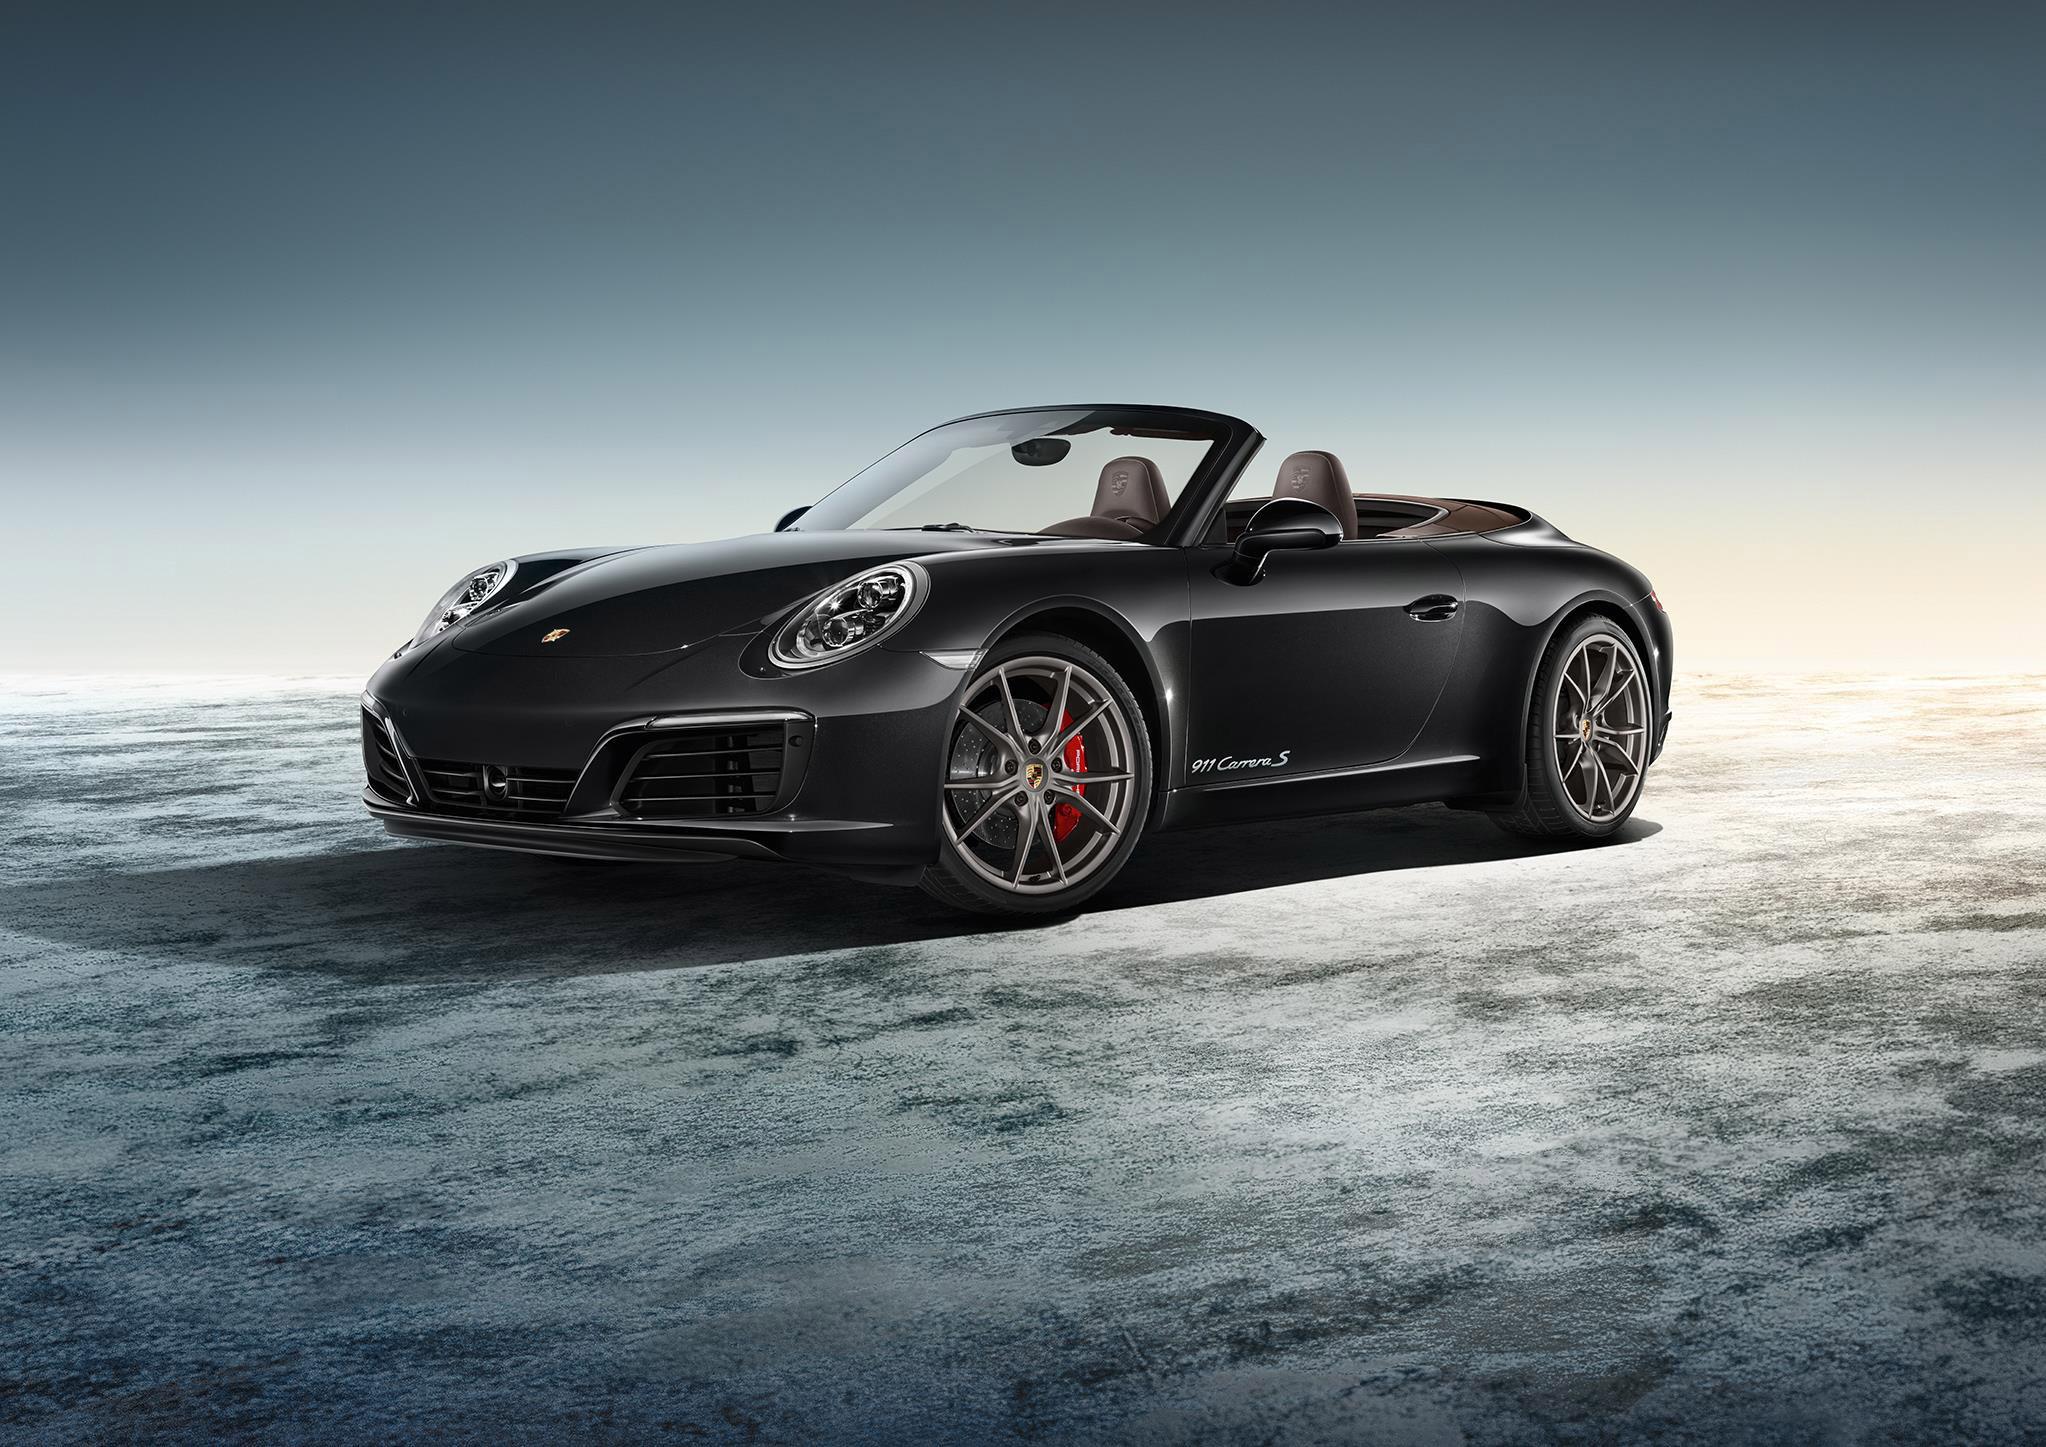 porsche 911 carrera s cabriolet by porsche exclusive. Black Bedroom Furniture Sets. Home Design Ideas